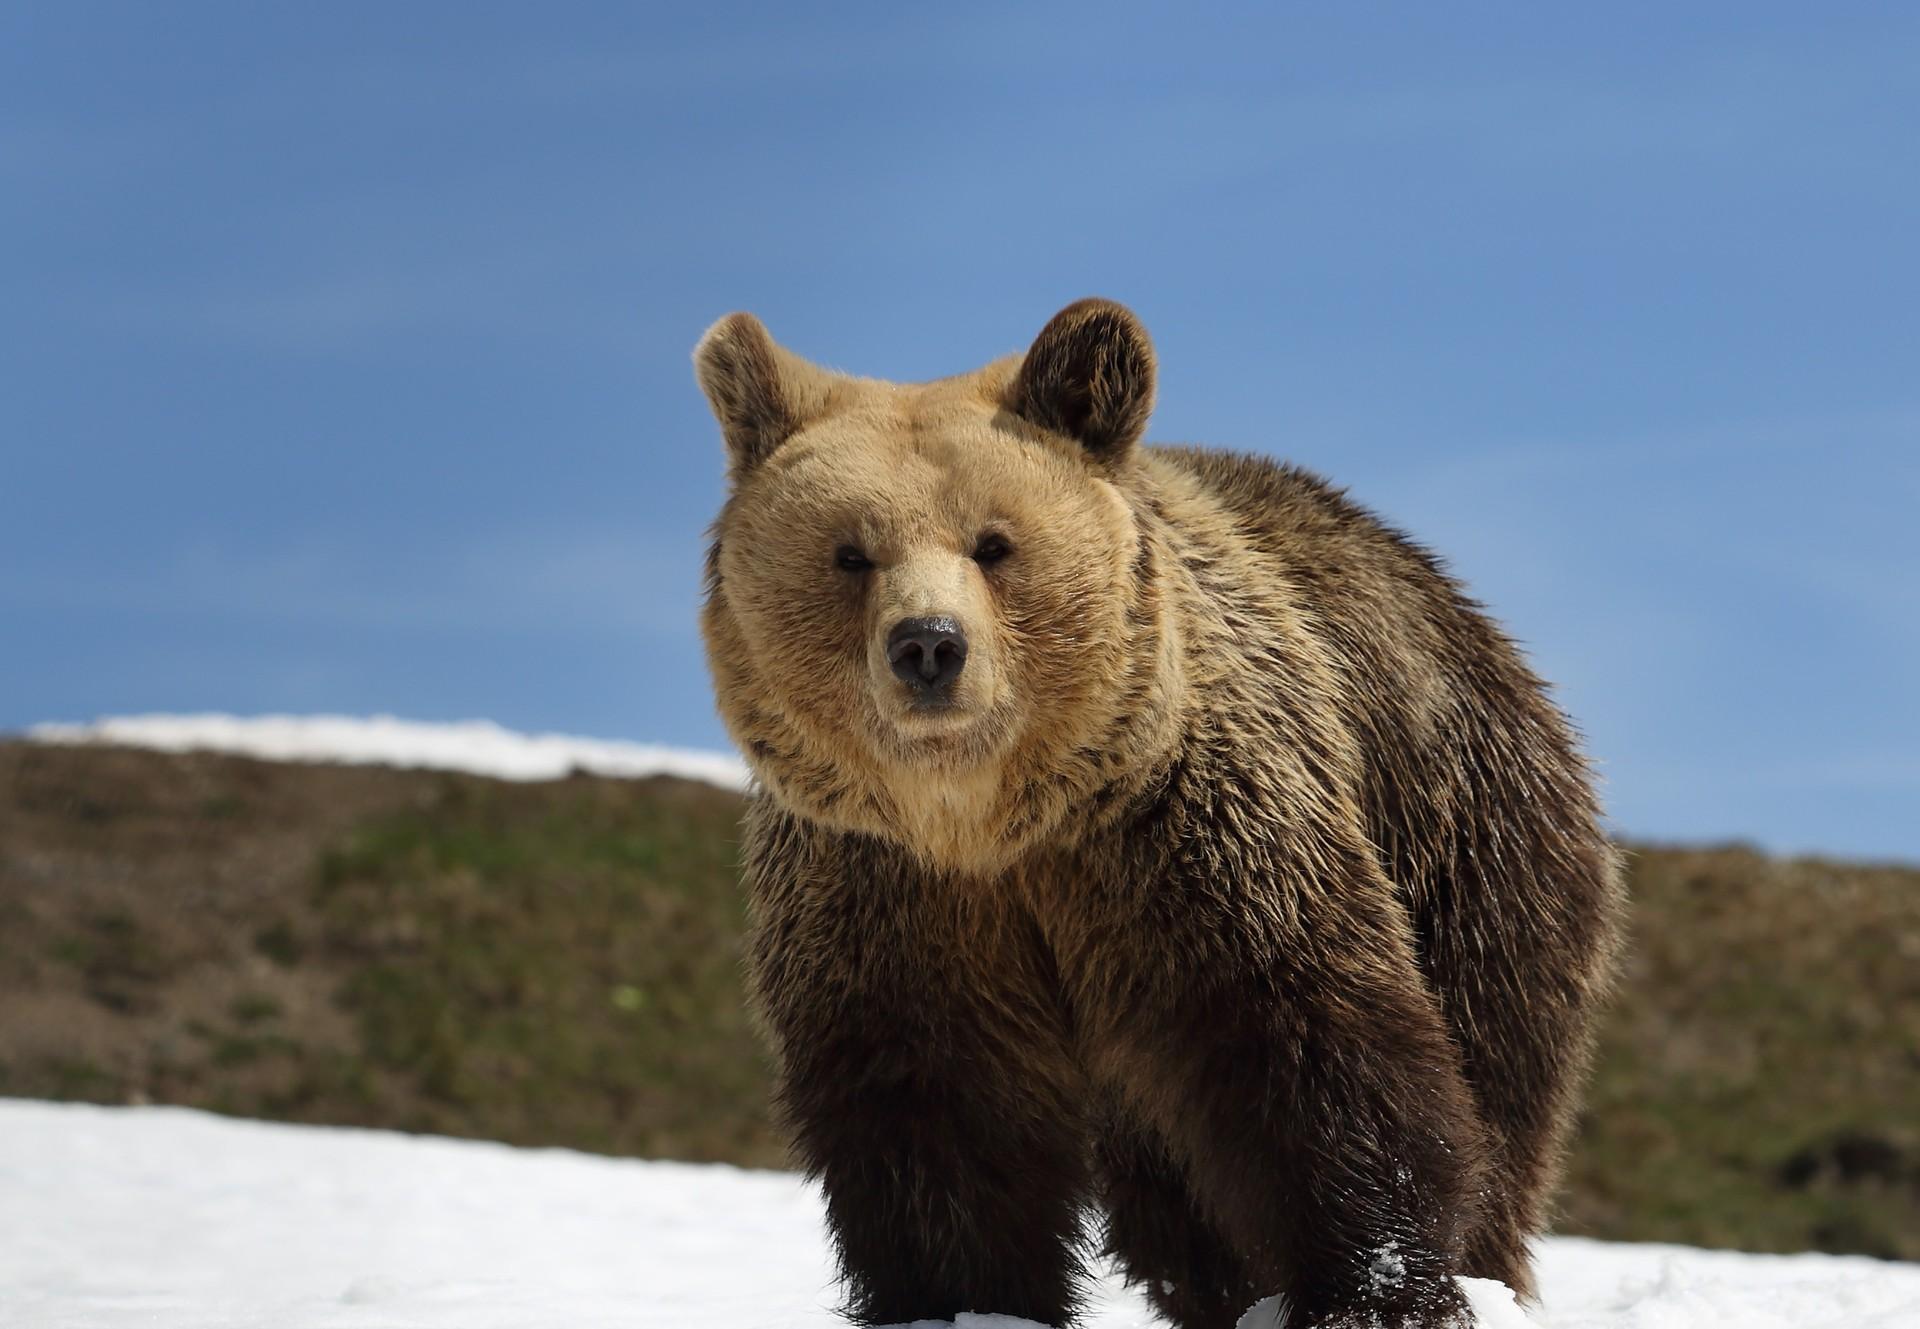 Bears in sanctuary